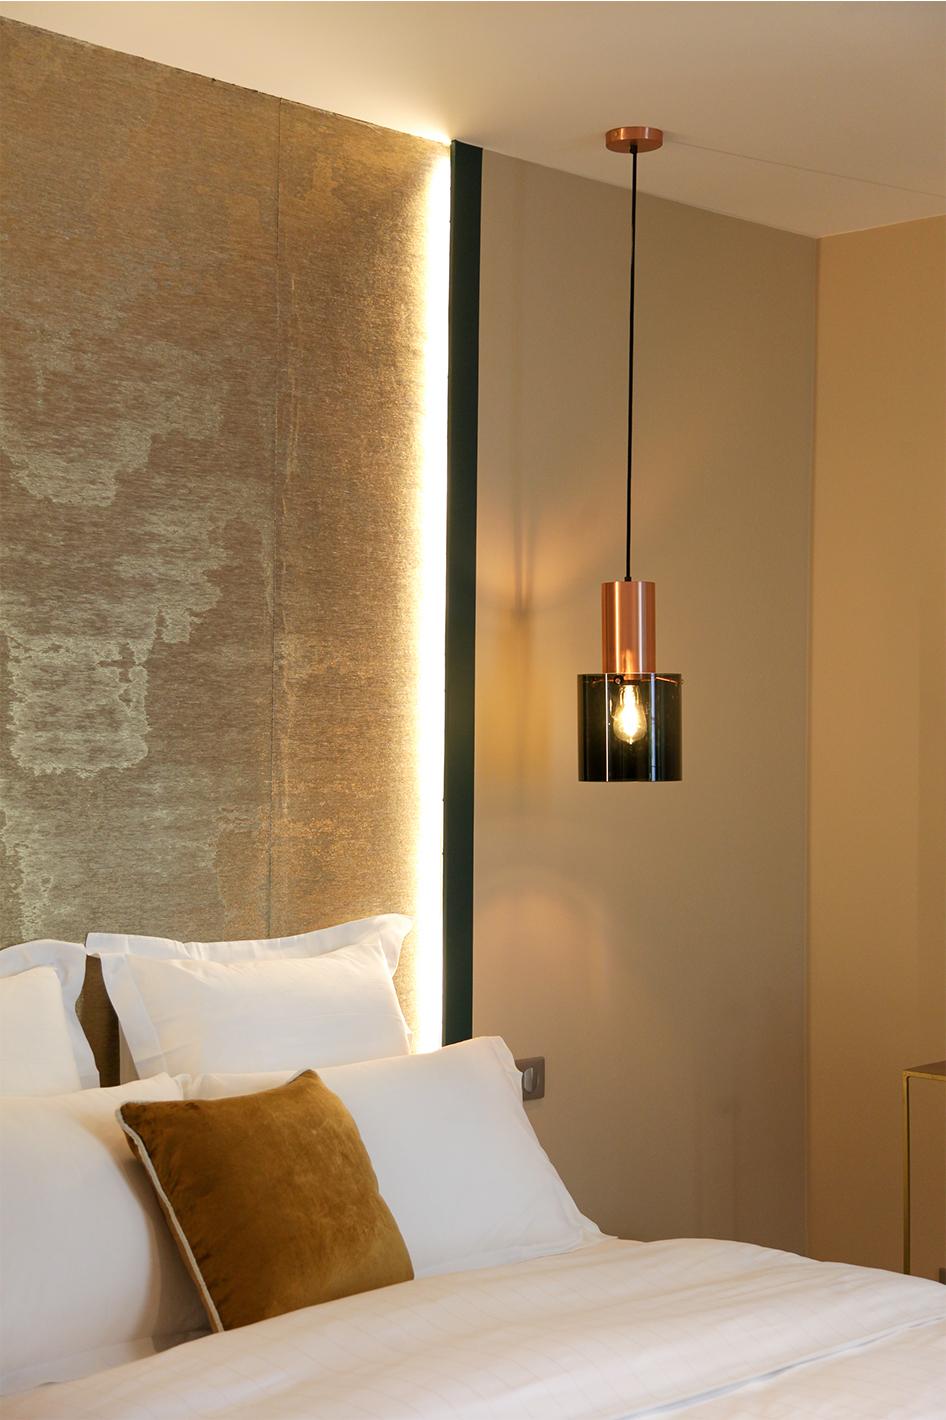 galerie2_0018_hotelsingulier-9